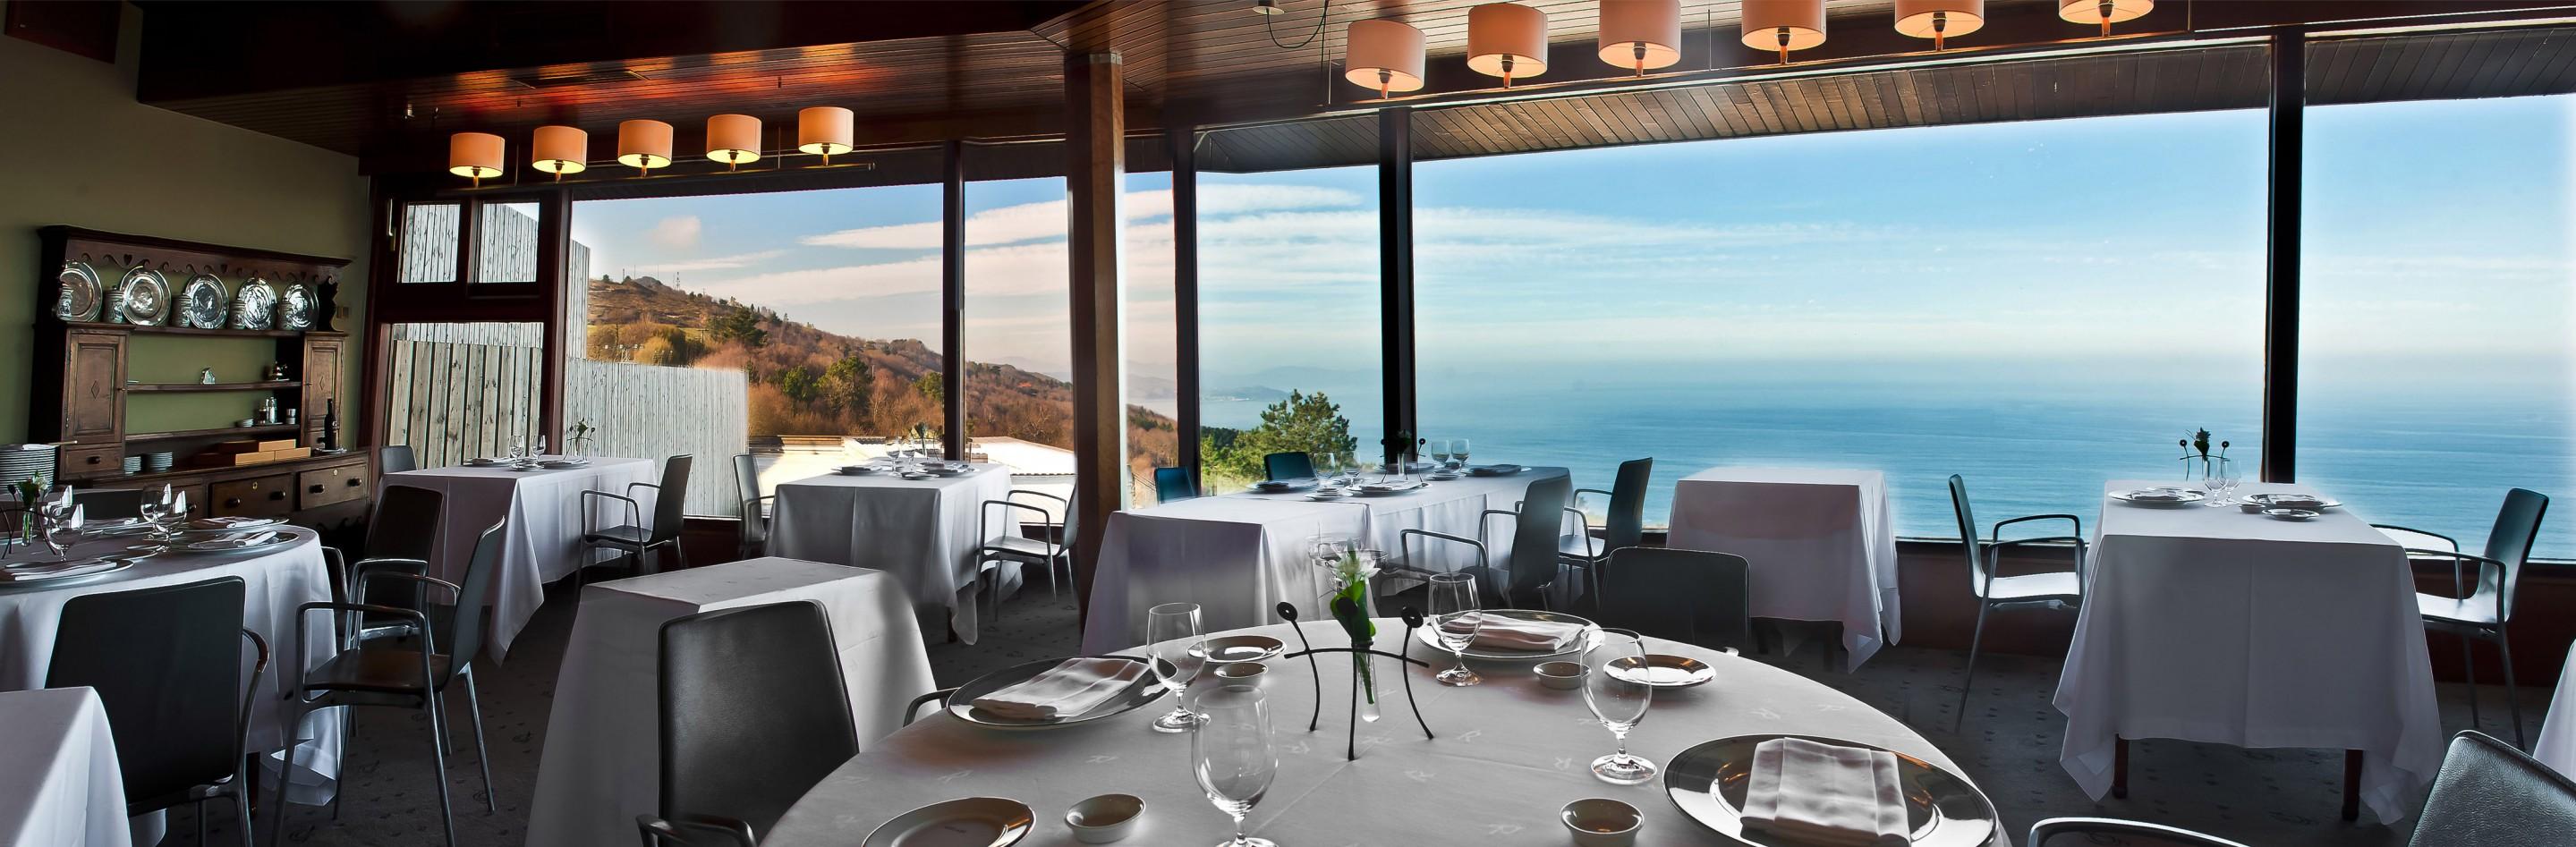 akelarre_restaurante__akelarre_160113